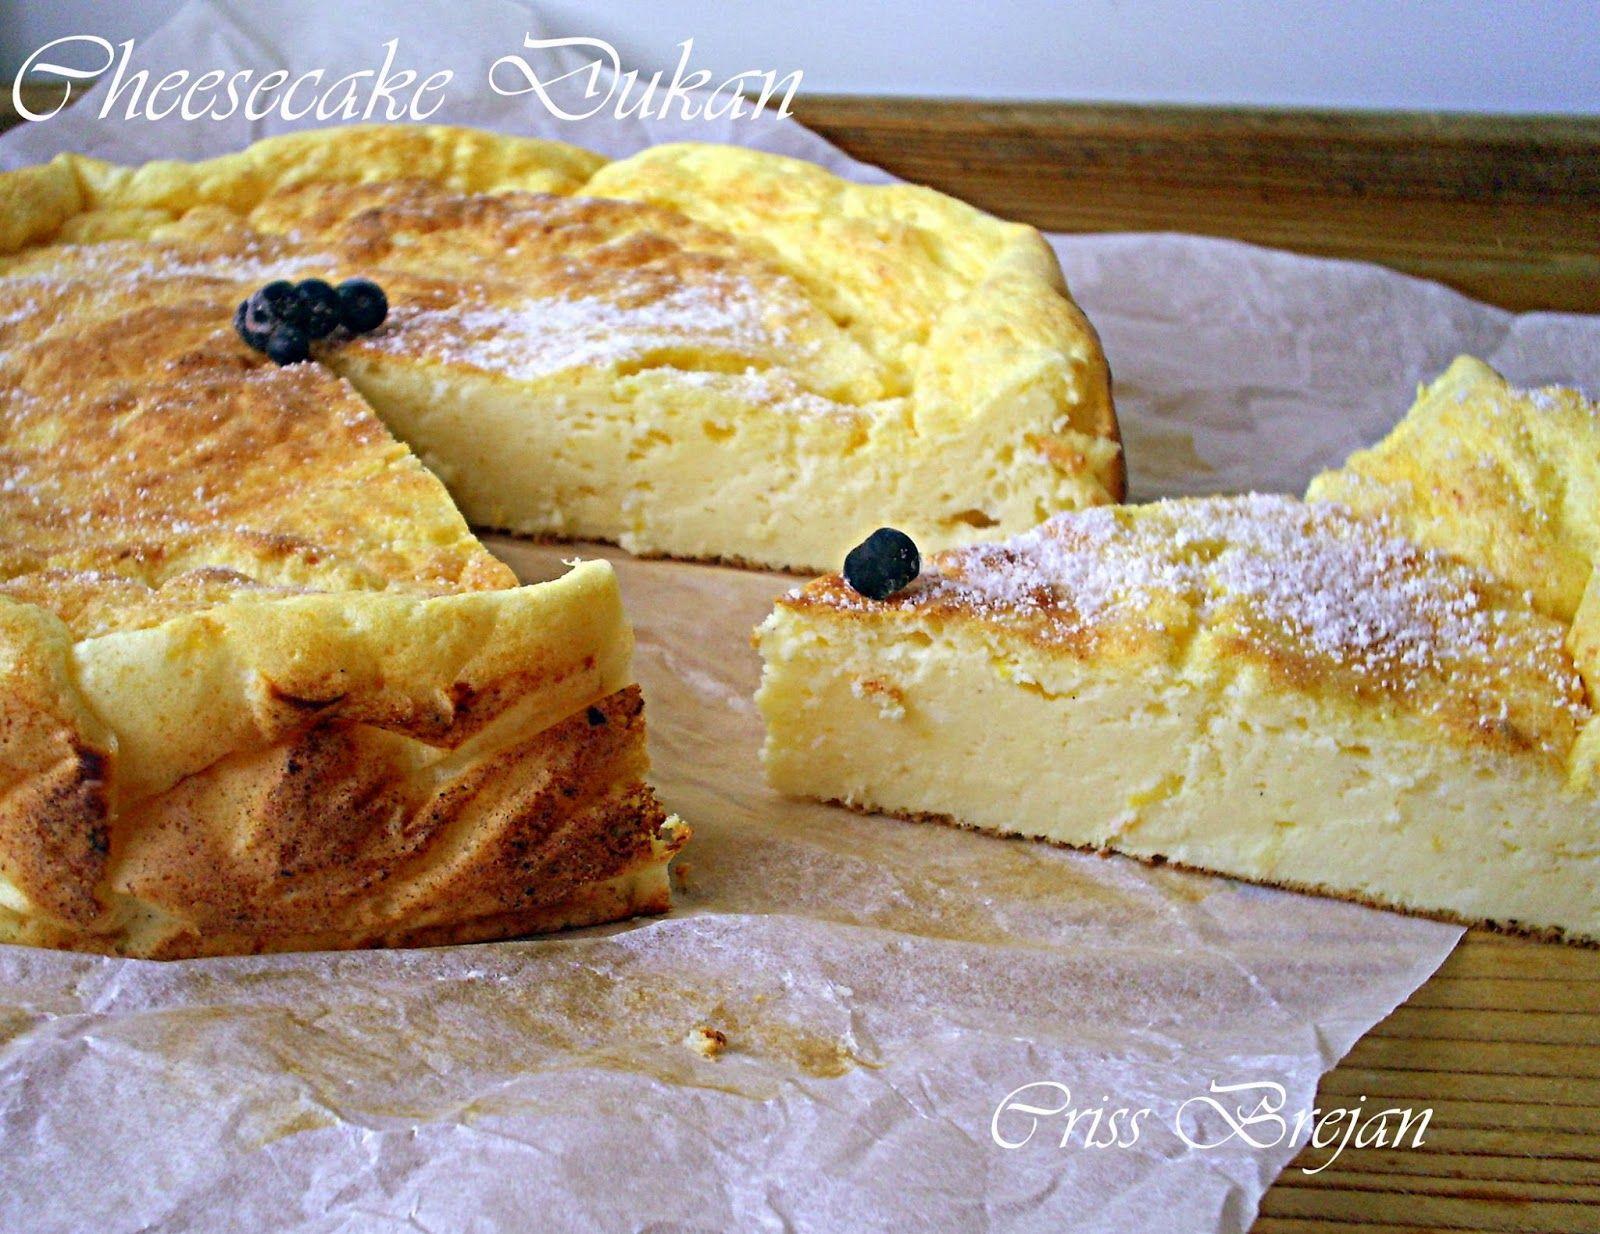 Arome si culori - Dukan: Cheesecake Dukan